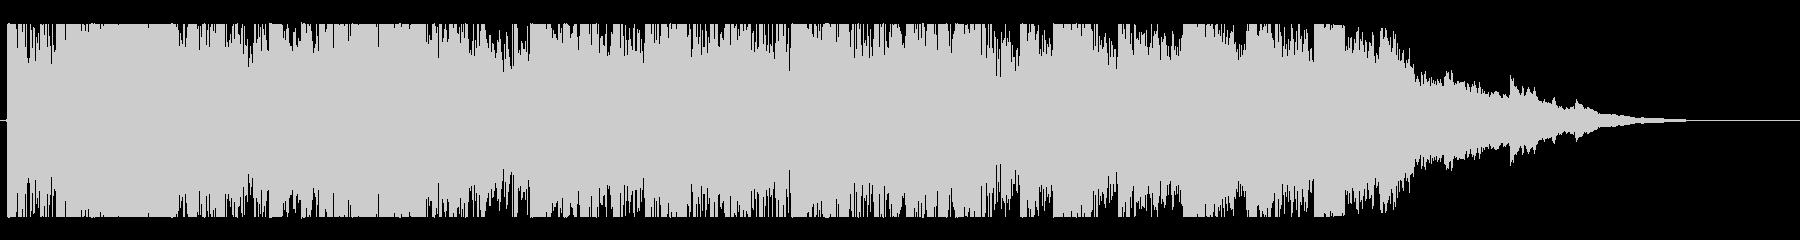 EDM, electronic short jingle's unreproduced waveform